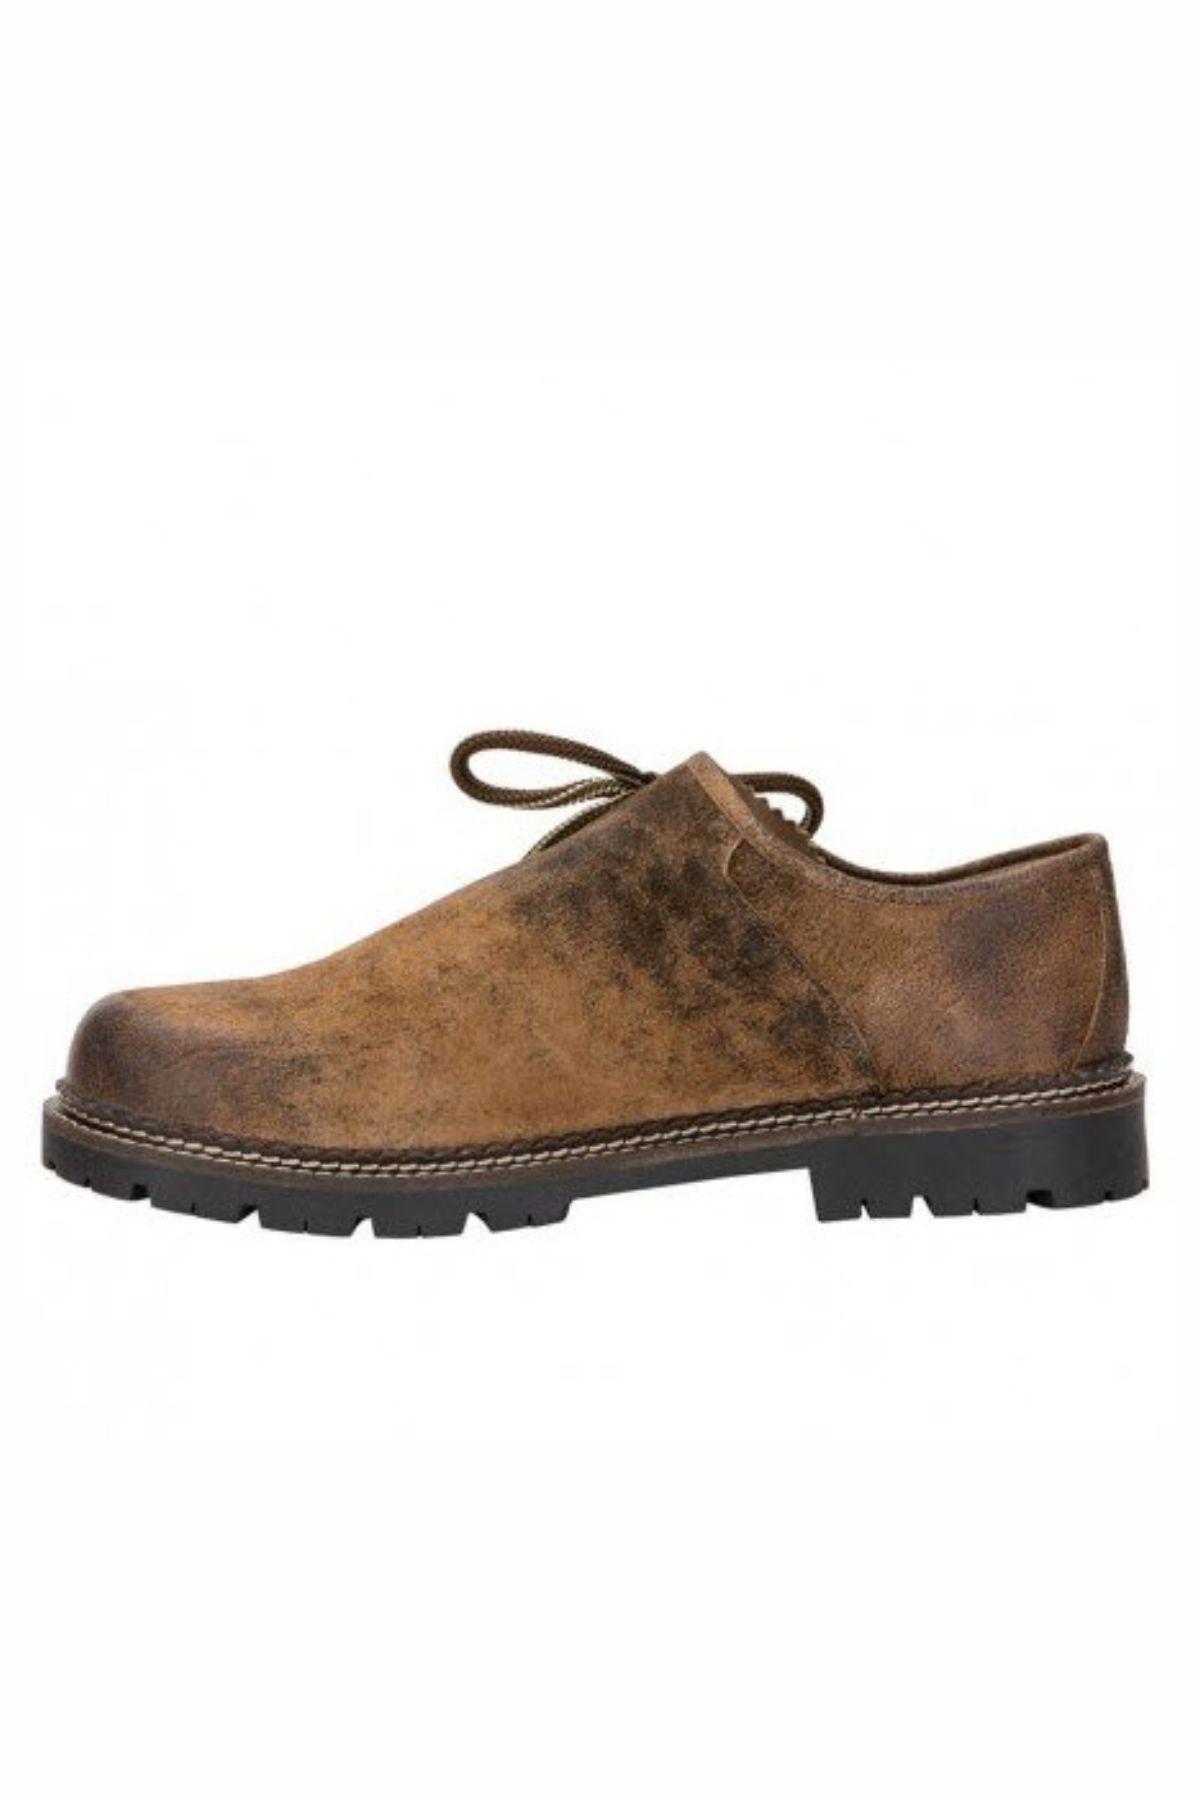 4acebd5f1139 German Lederhosen Shoes for Men Clean Brown - Lederhosen Store